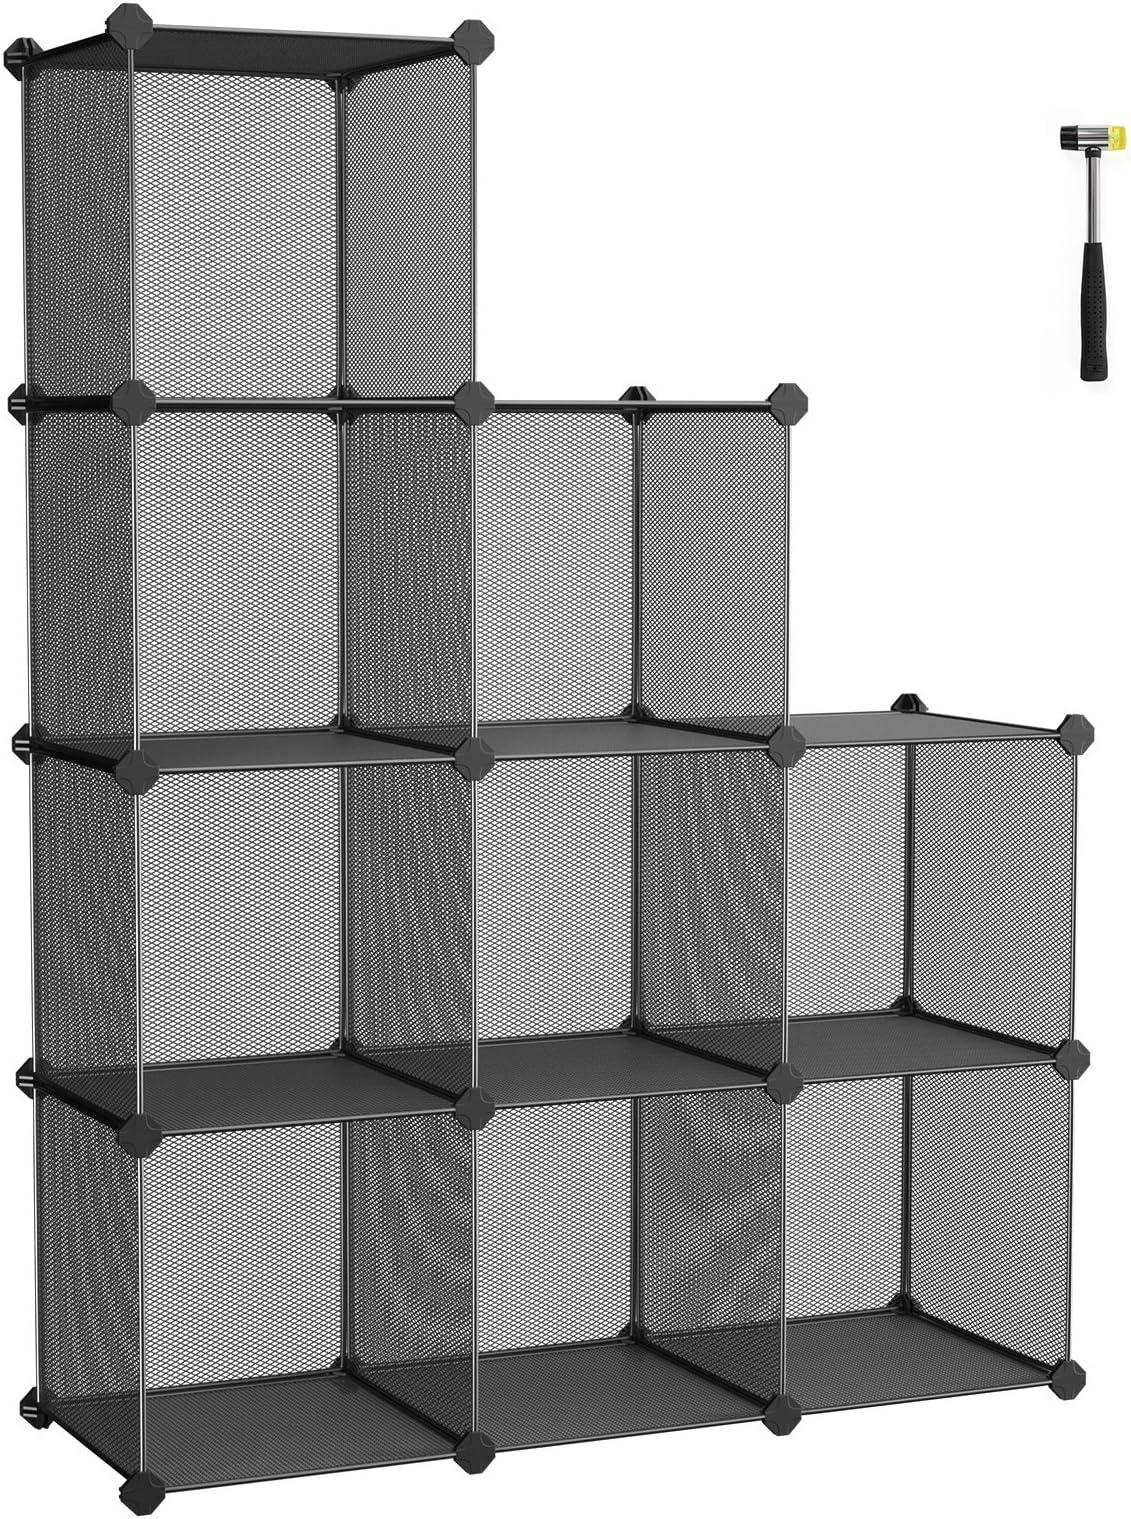 SONGMICS Storage Cubes ULPC33B/115S-ULPL115H/115W  sc 1 st  Amazon.com & Office Storage Cabinets | Amazon.com | Office Furniture u0026 Lighting ...